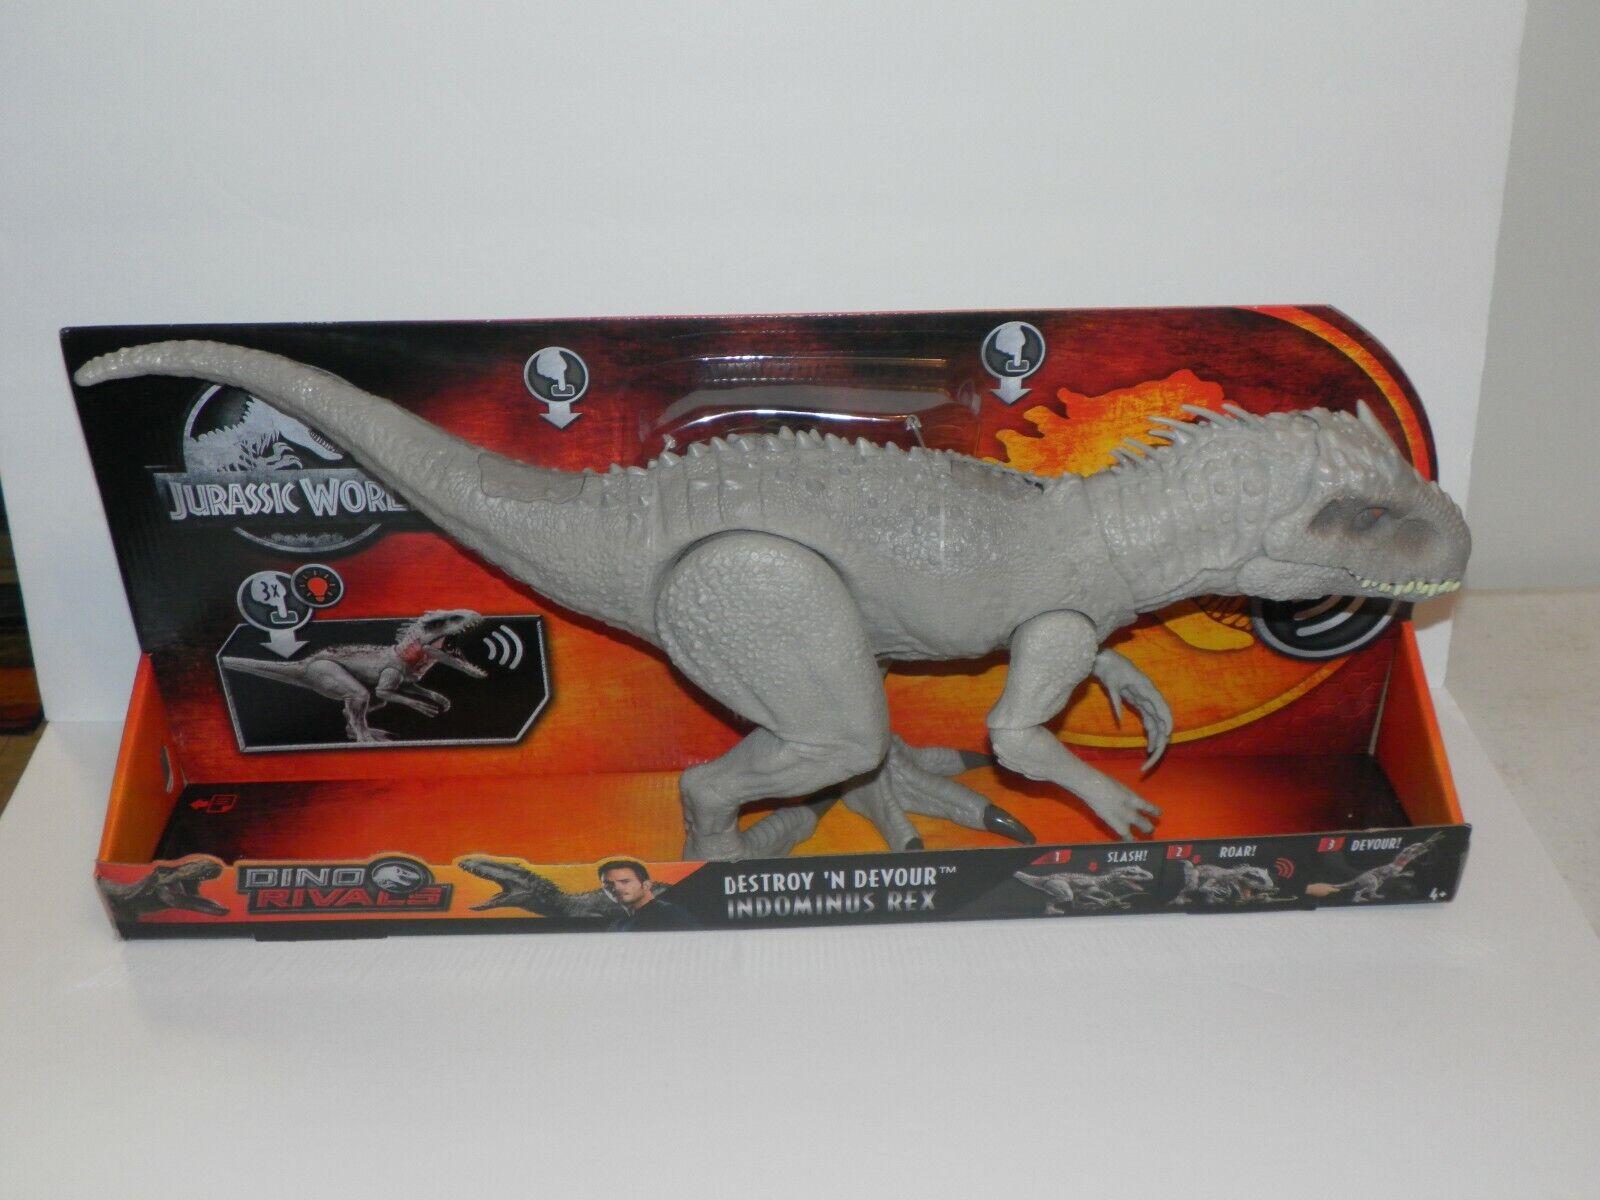 En Mano indominus Rex destruir 'n devorar Jurassic World JP 23  Largo Dino rivales